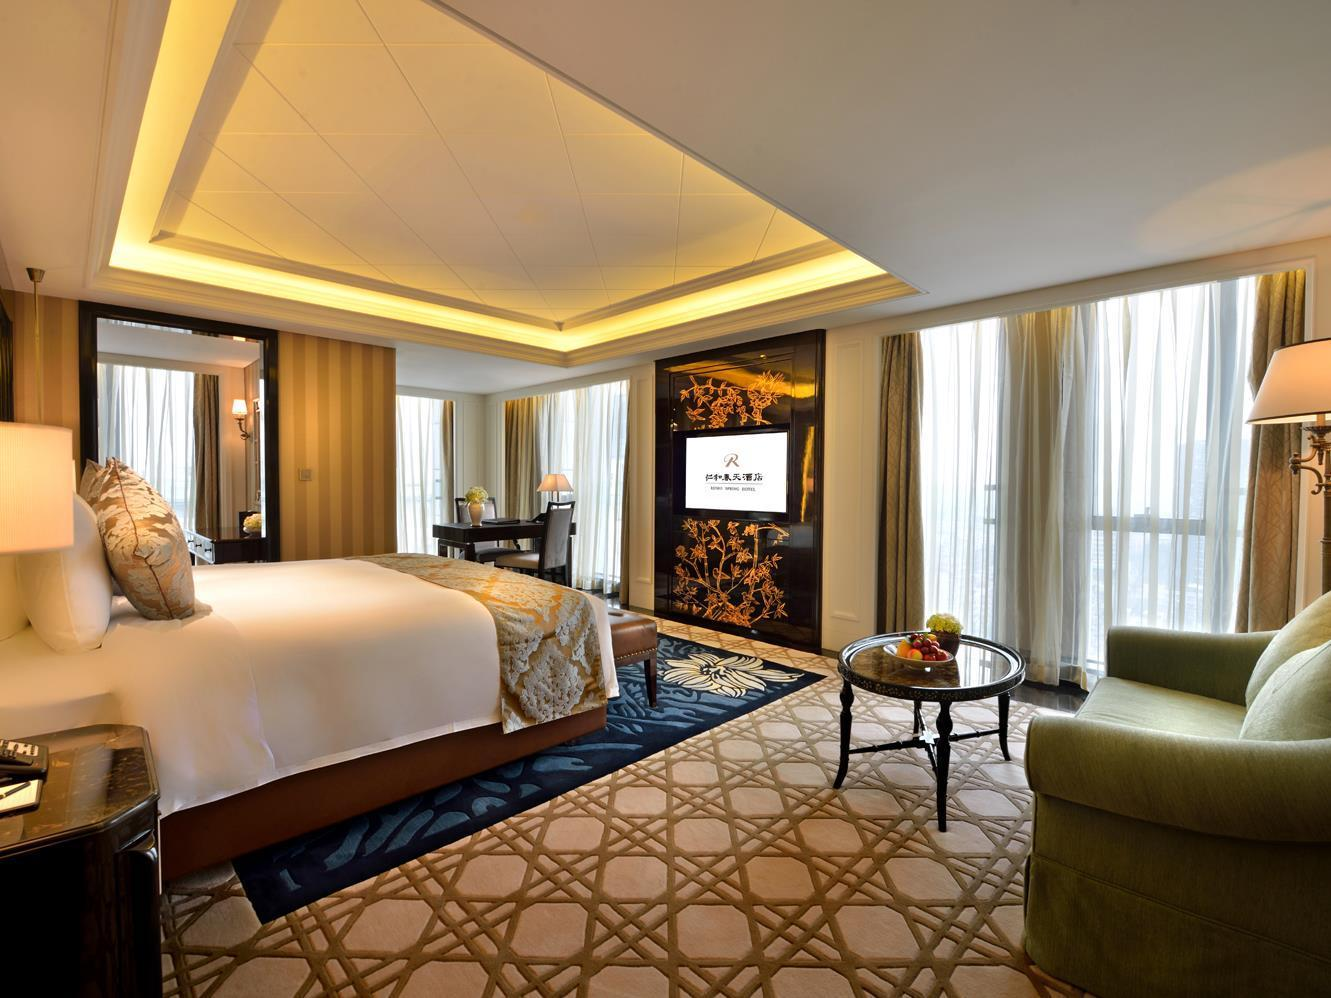 Chengdu Ren He Spring Hotel